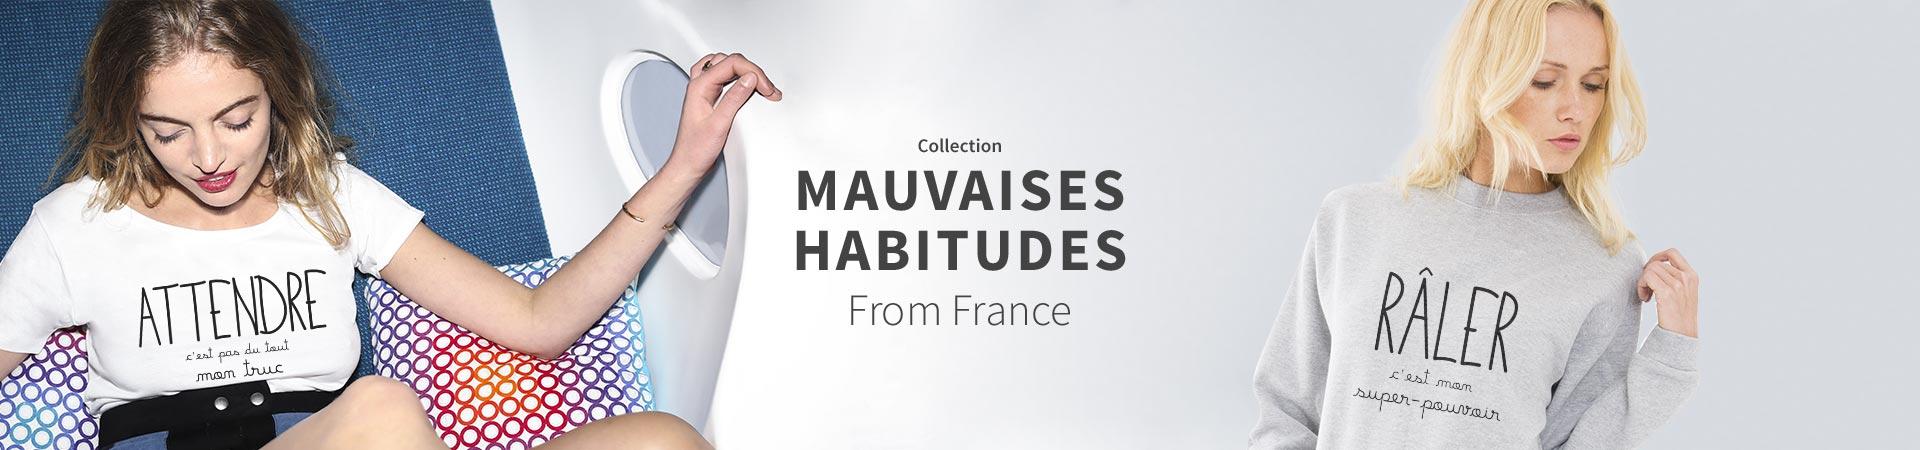 Collection Mauvaises Habitudes